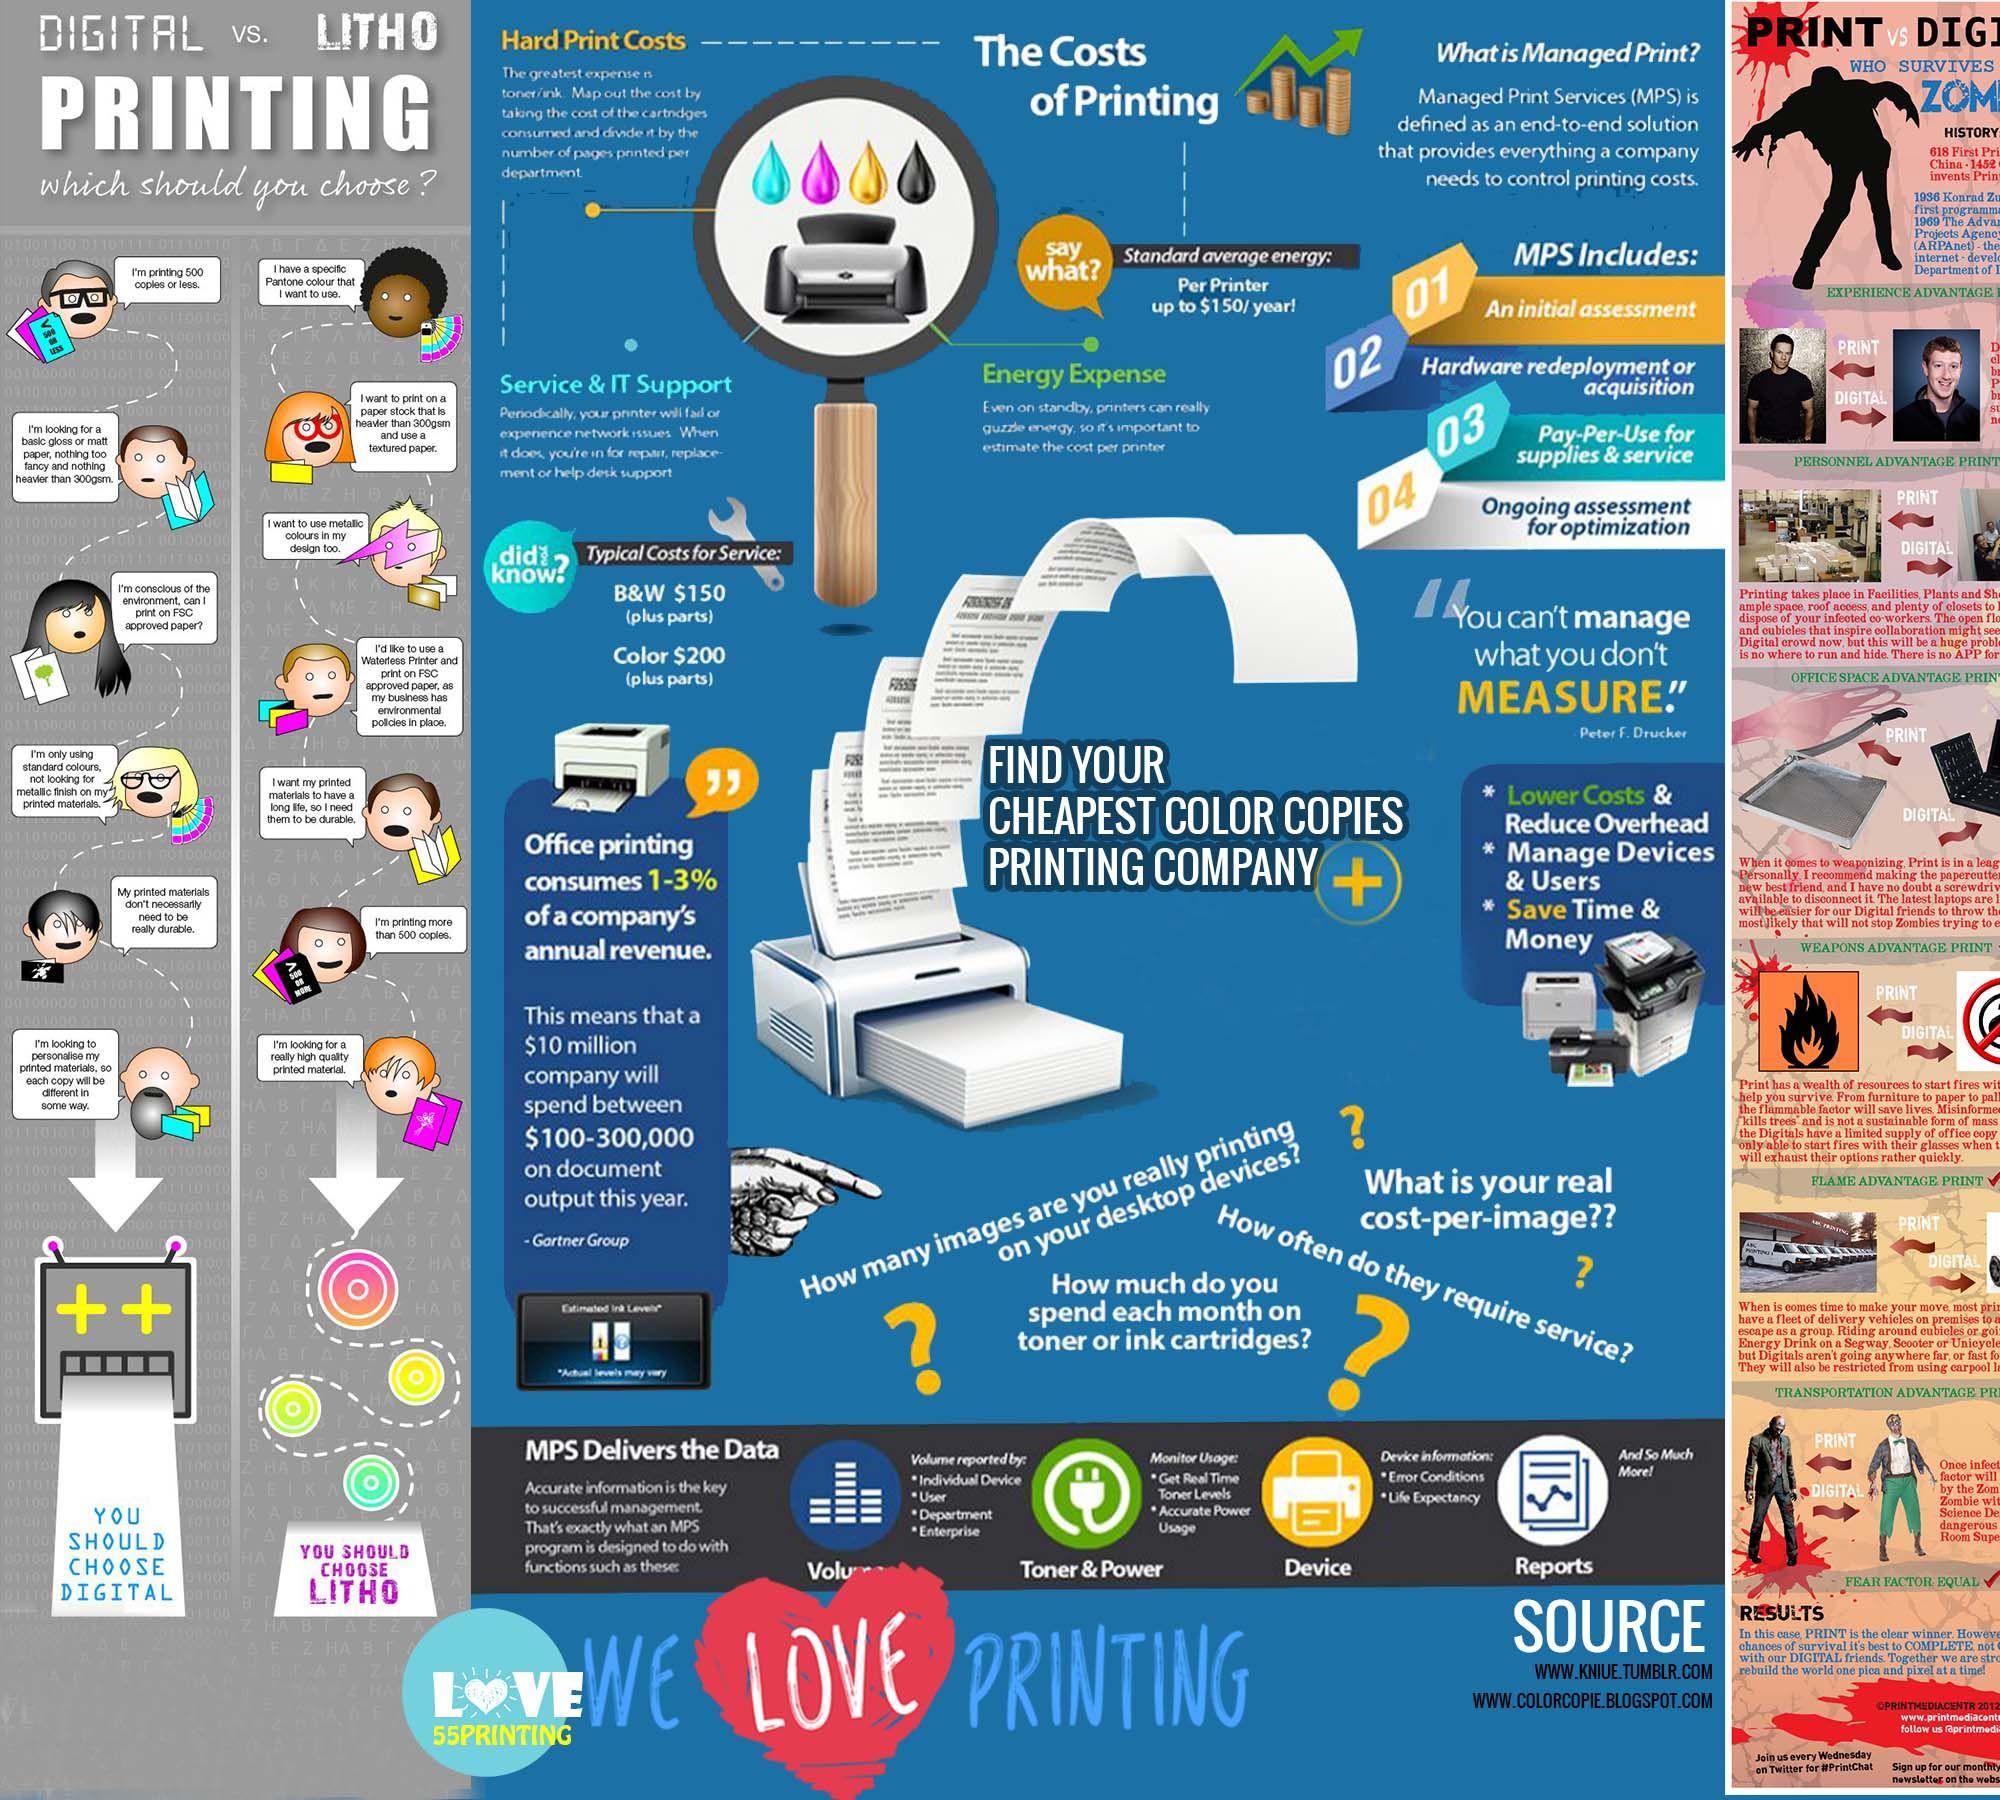 Cheap Color Copies Print Infographic Printing Places Cheap Shop